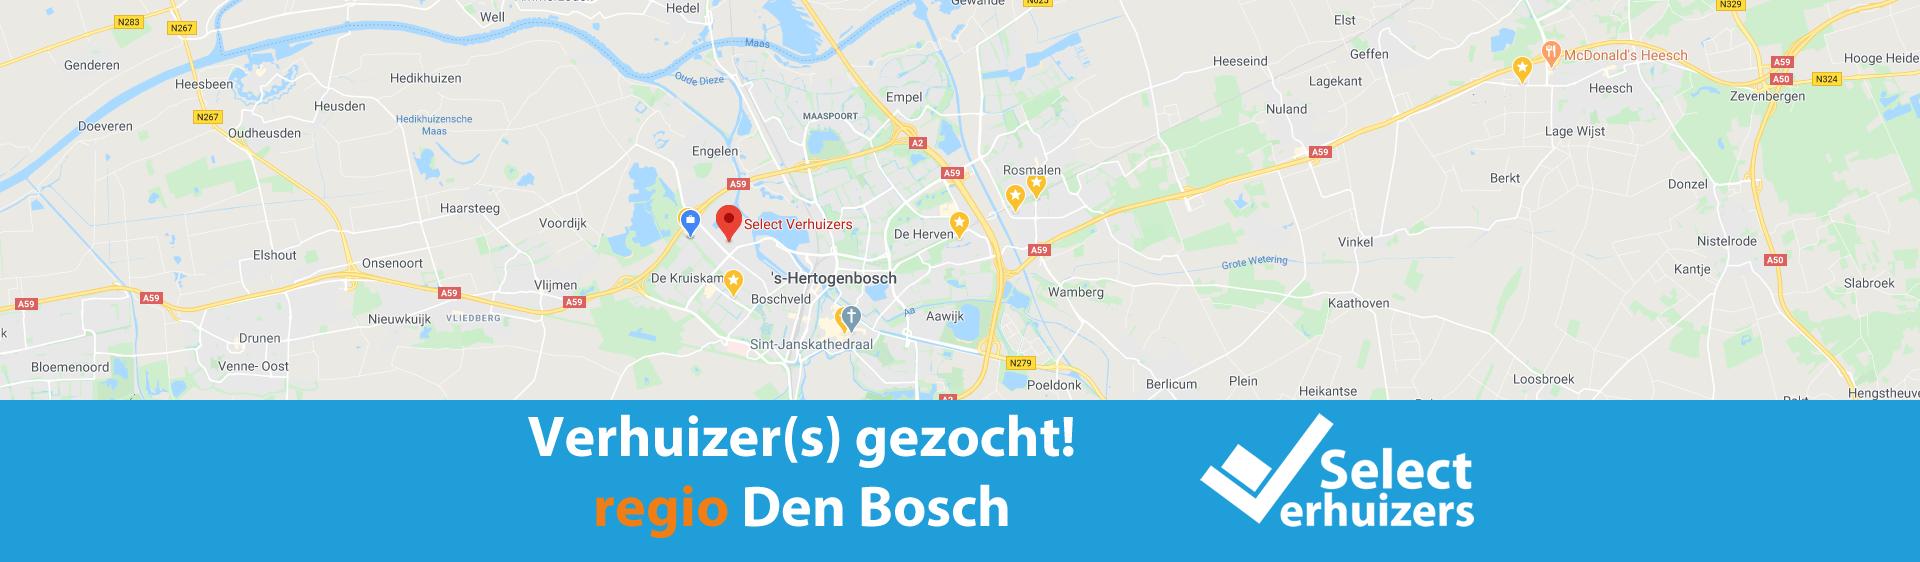 Vacature: verhuizer 3 - Regio Den Bosch